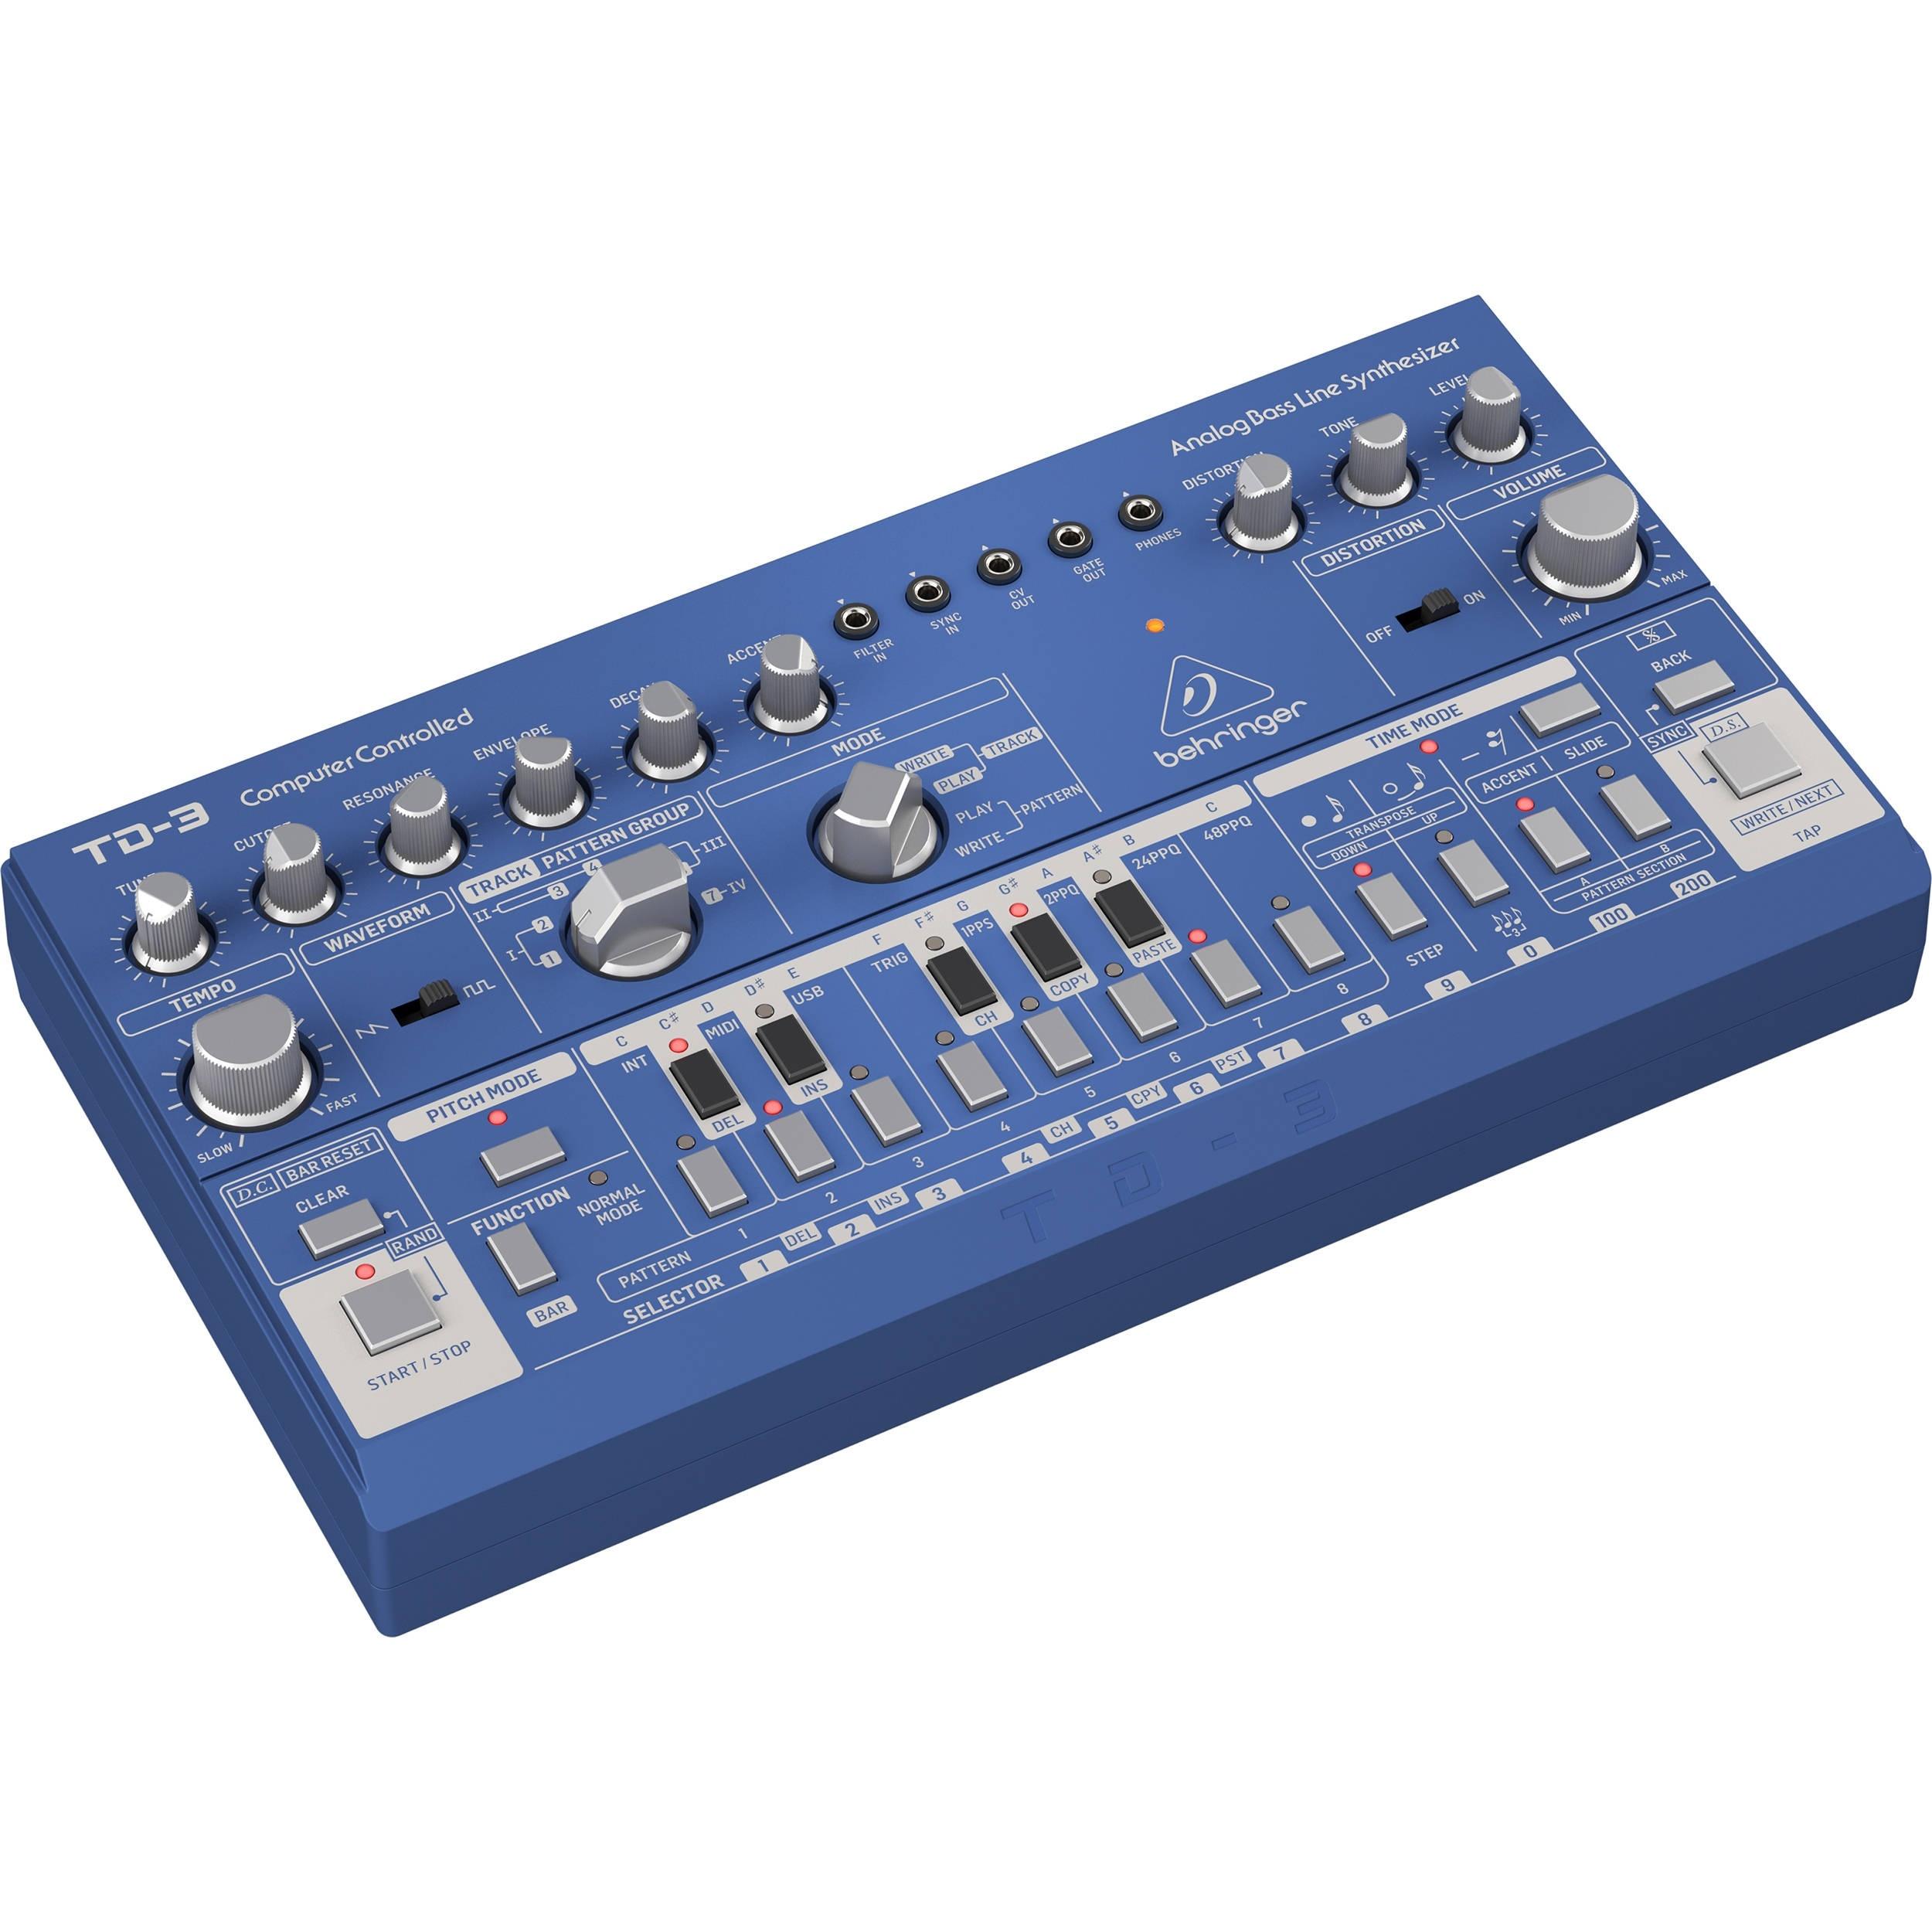 Behringer TD-3 Analog Bass Line Synthesizer (Blue)